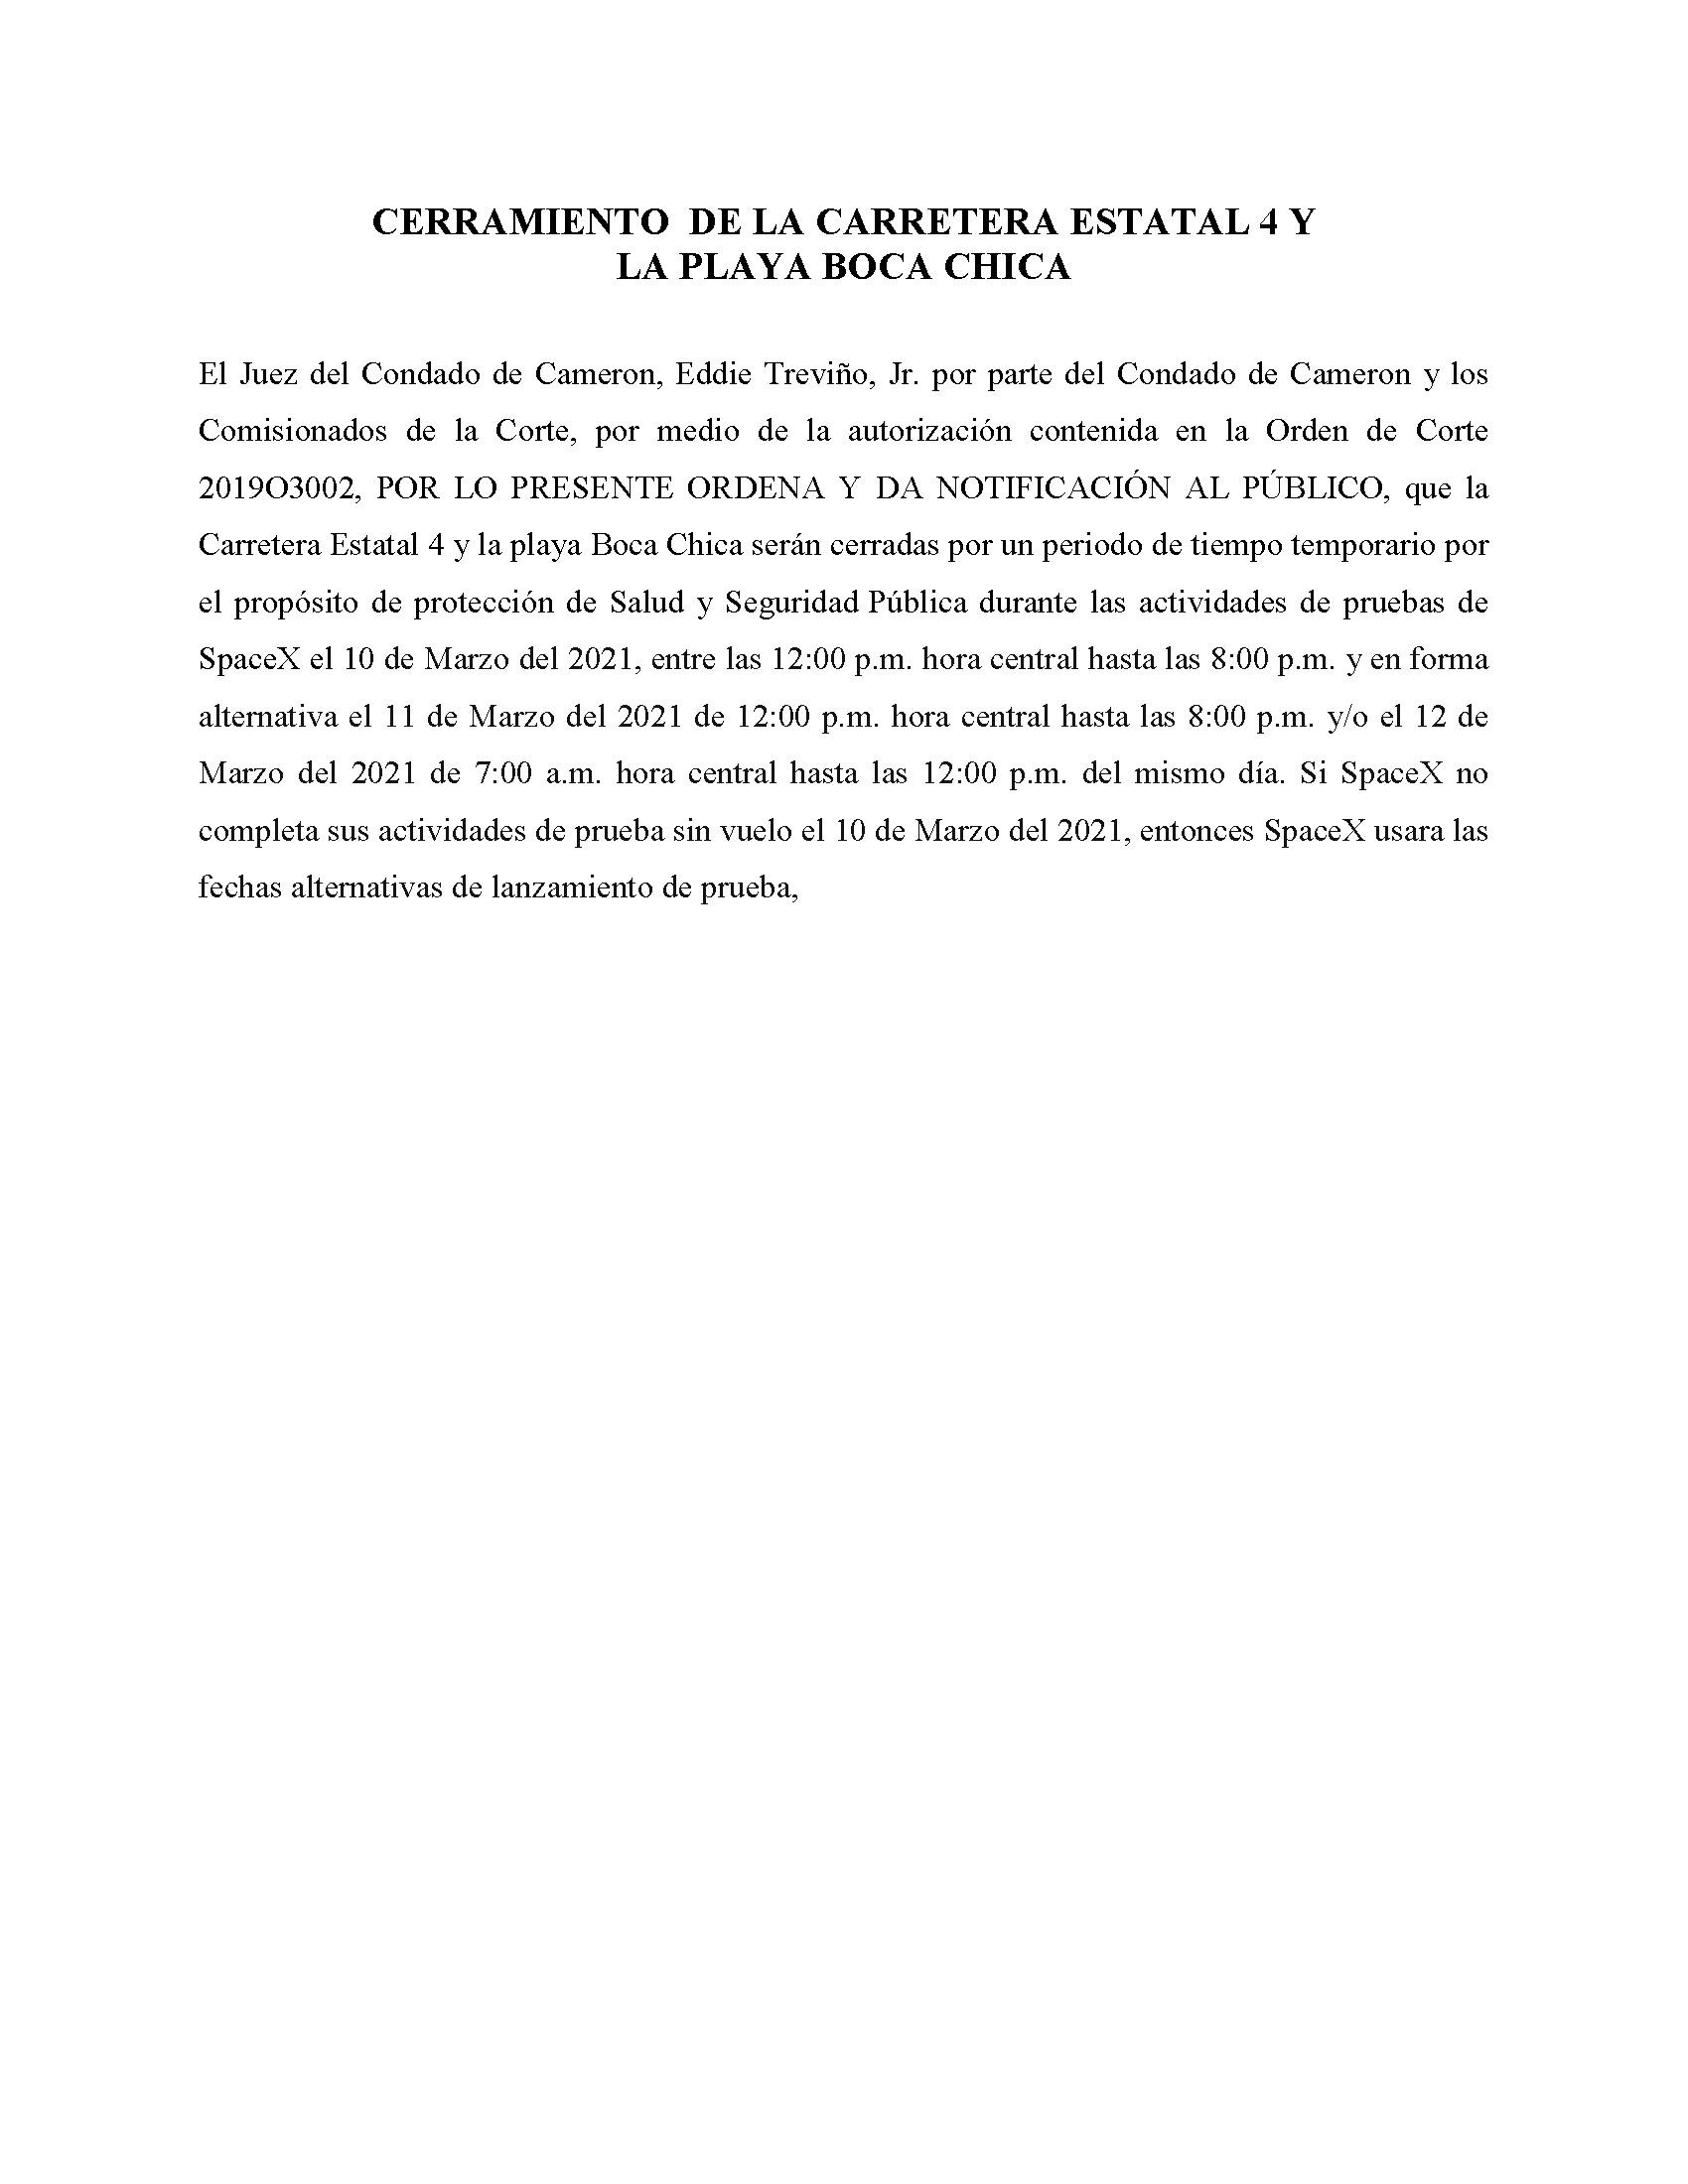 ORDER.CLOSURE OF HIGHWAY 4 Y LA PLAYA BOCA CHICA.SPANISH.03.10.2021